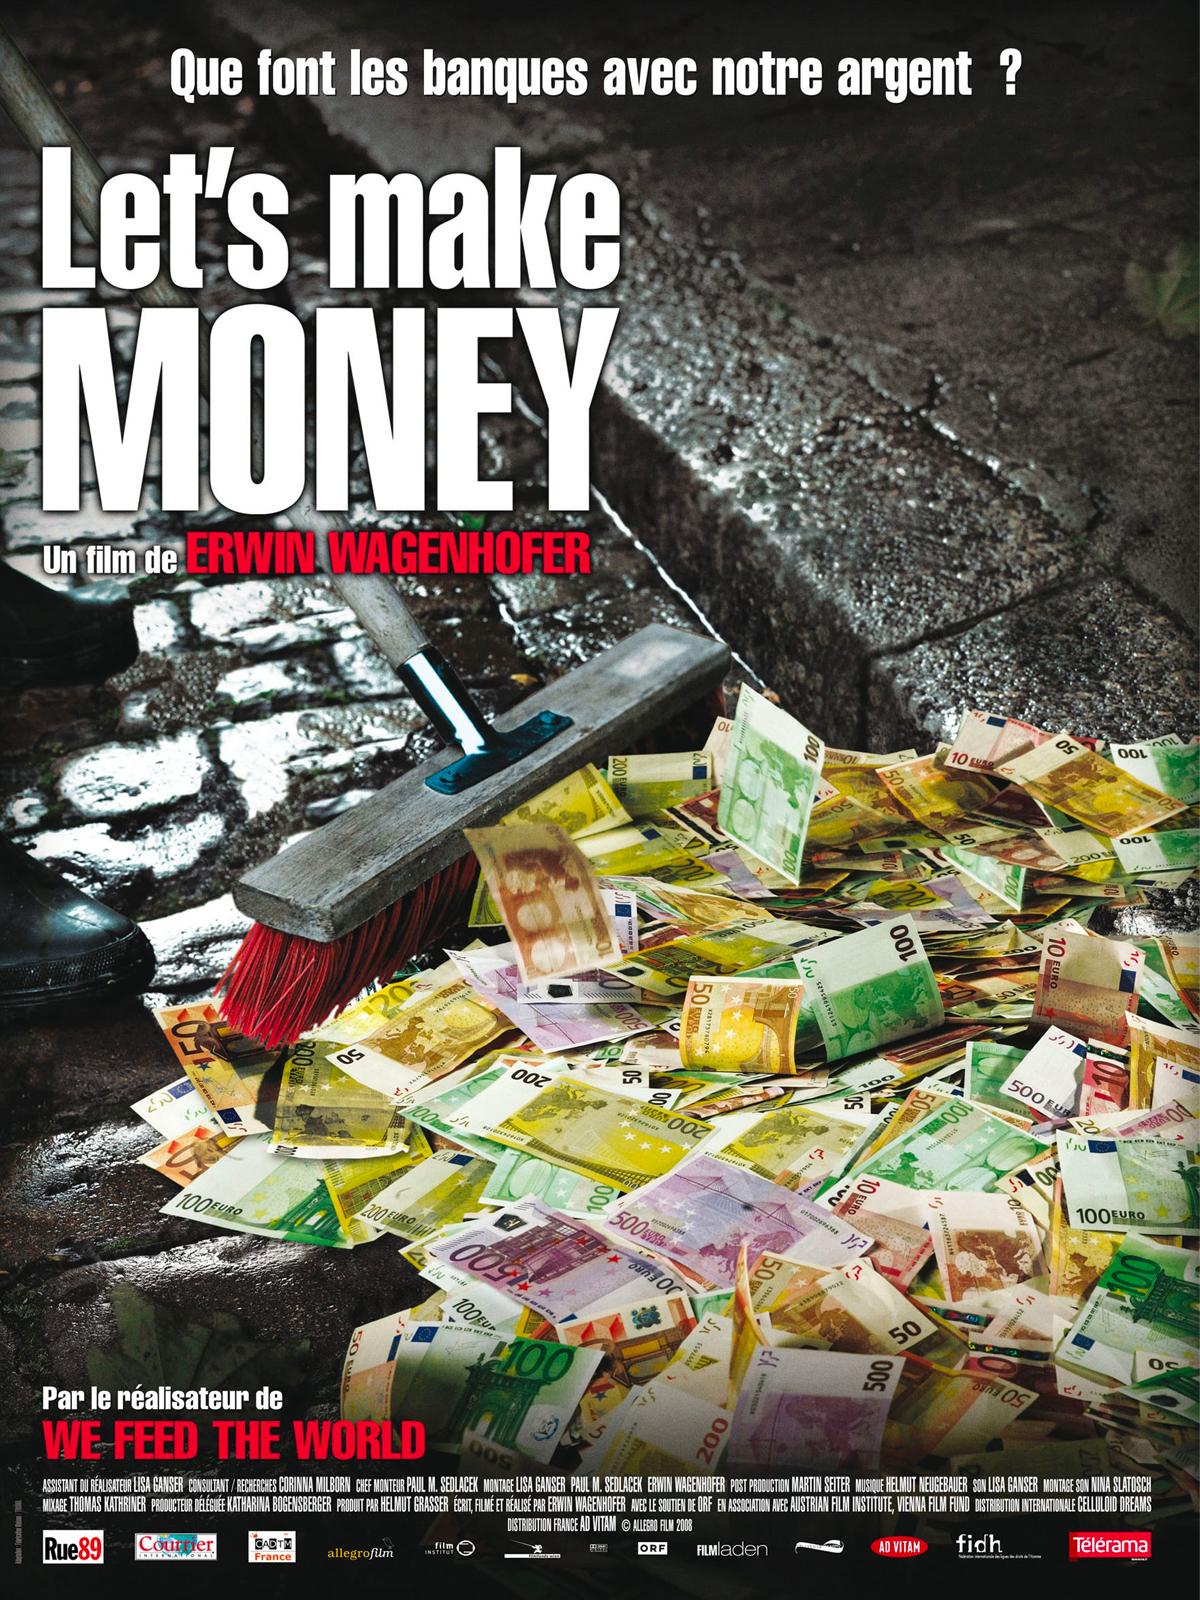 Let's Make Money | Wagenhofer, Erwin (Réalisateur)